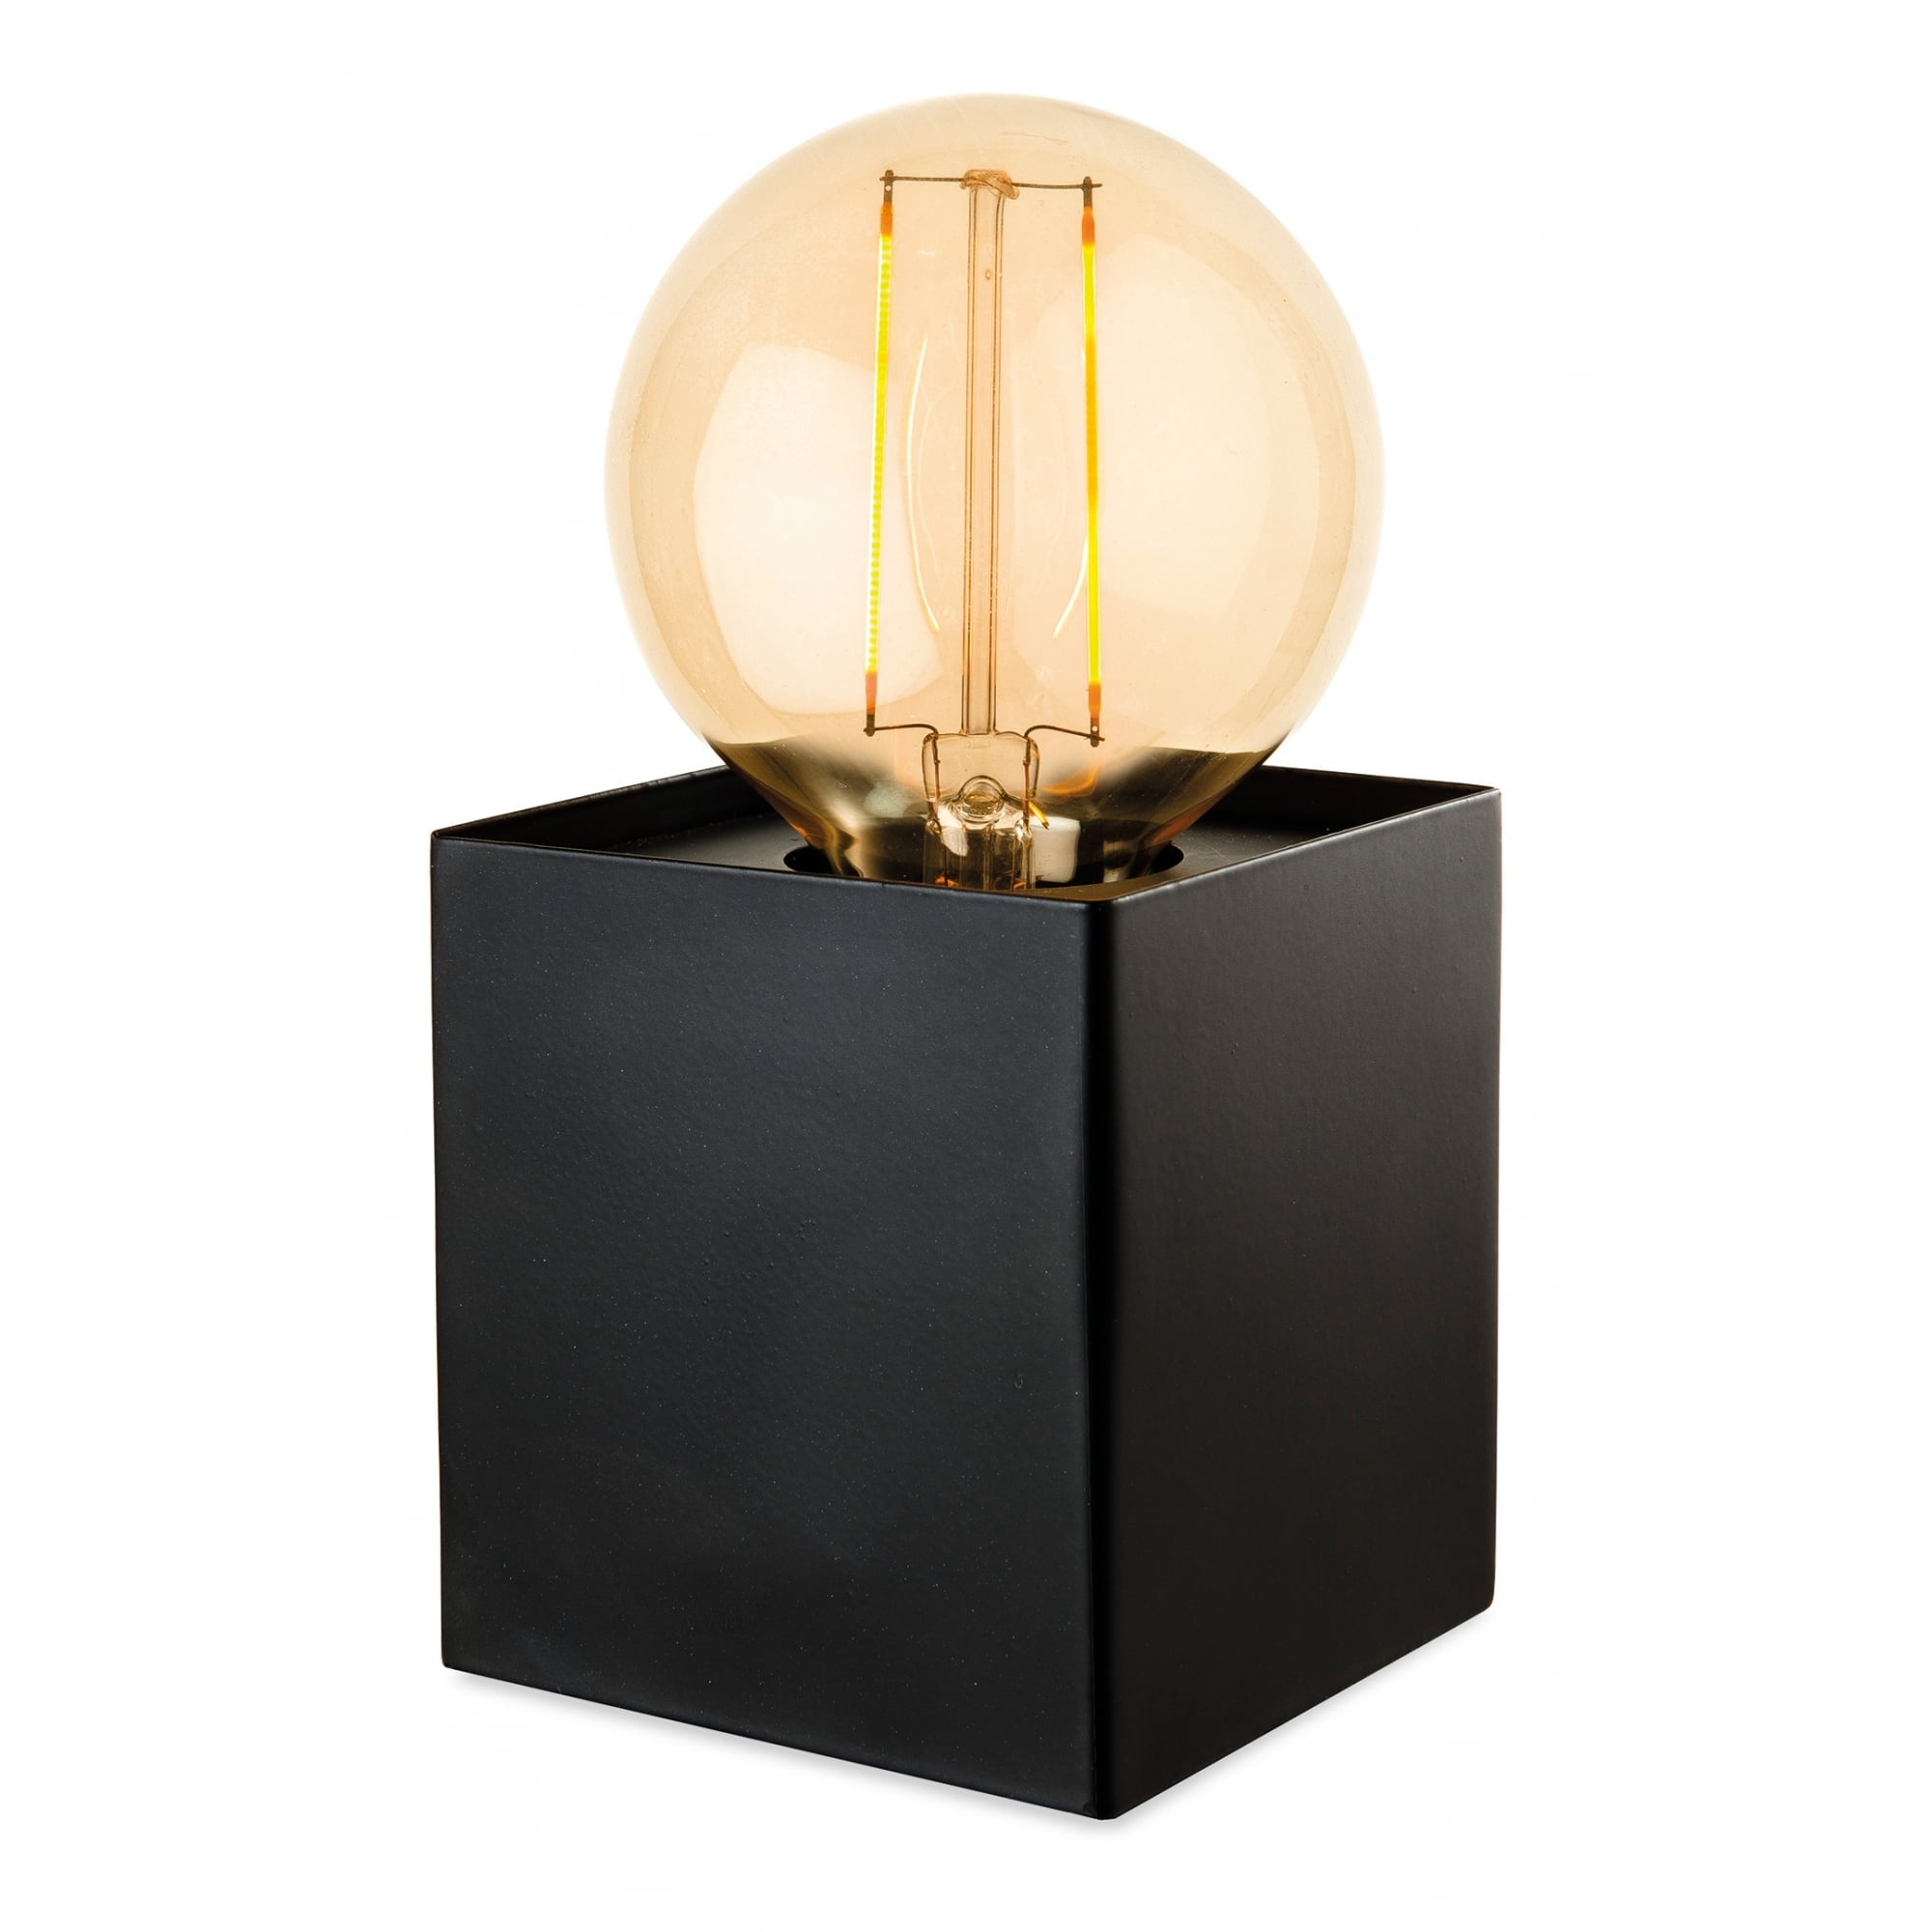 Small Black Box Table Lamp Great For Desk Lighting